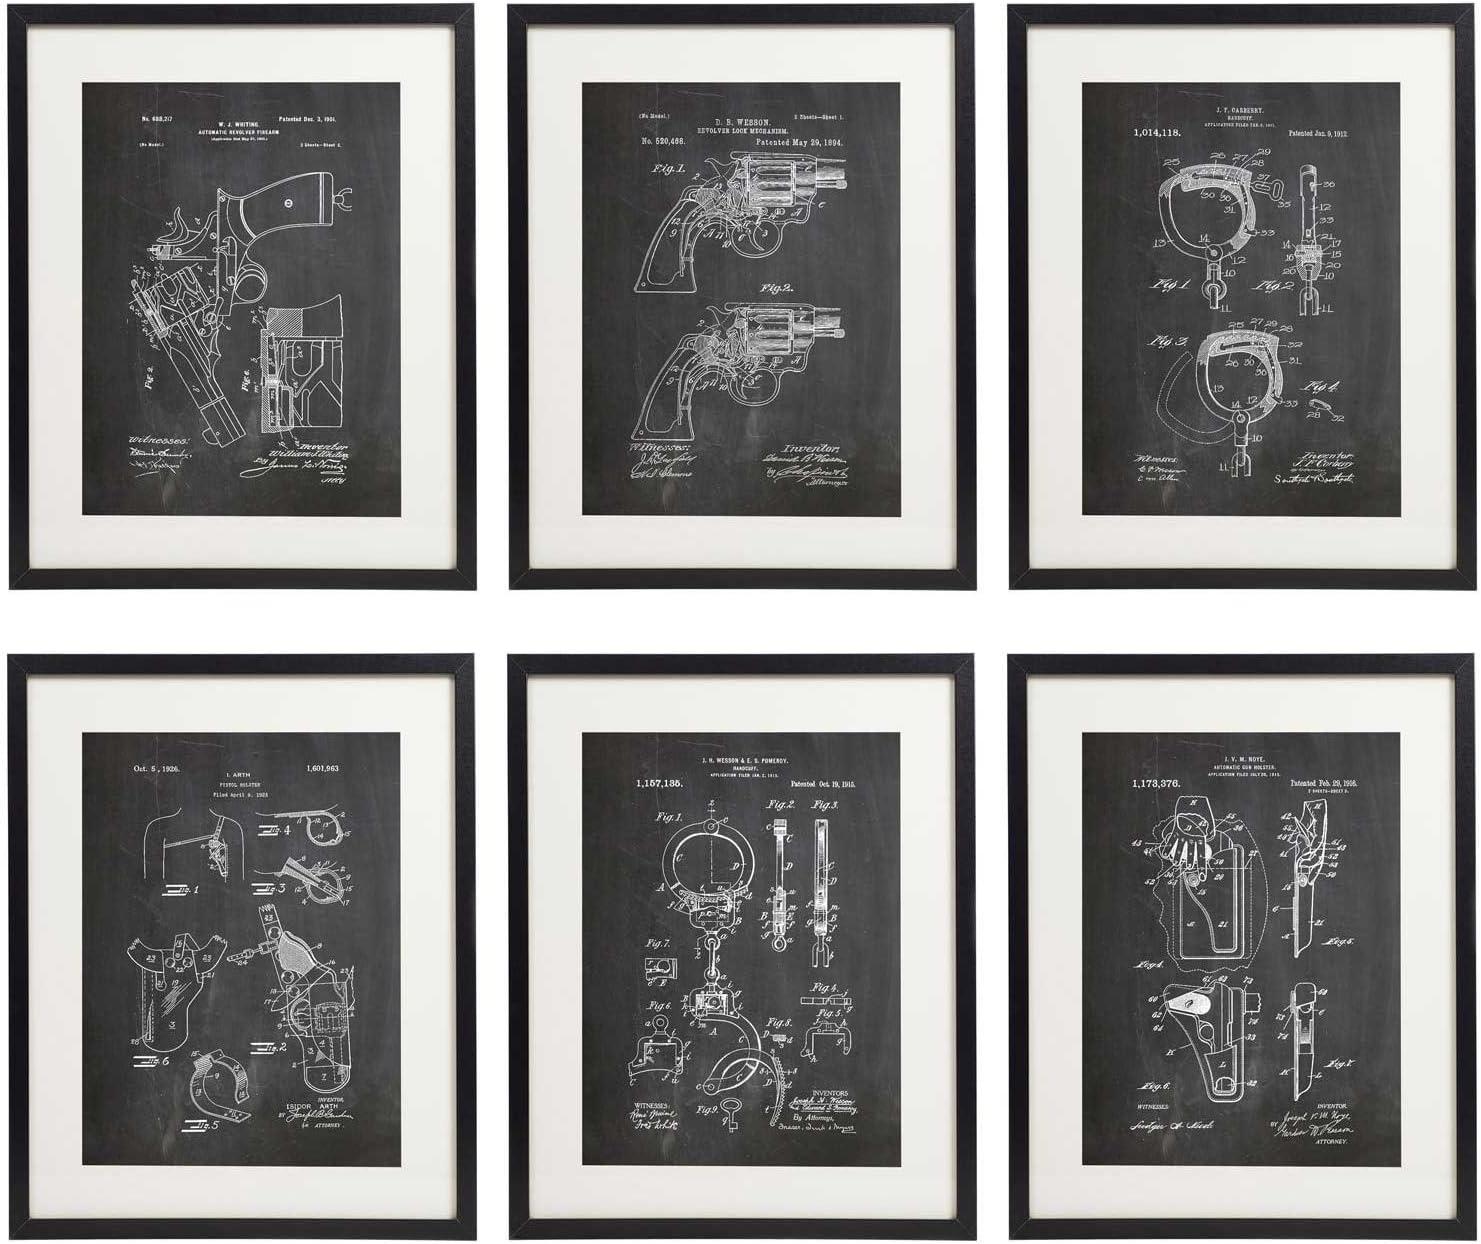 IDIOPIX Police Patent Wall Decor Chalkboard Art Print Set of 6 Prints UNFRAMED 02